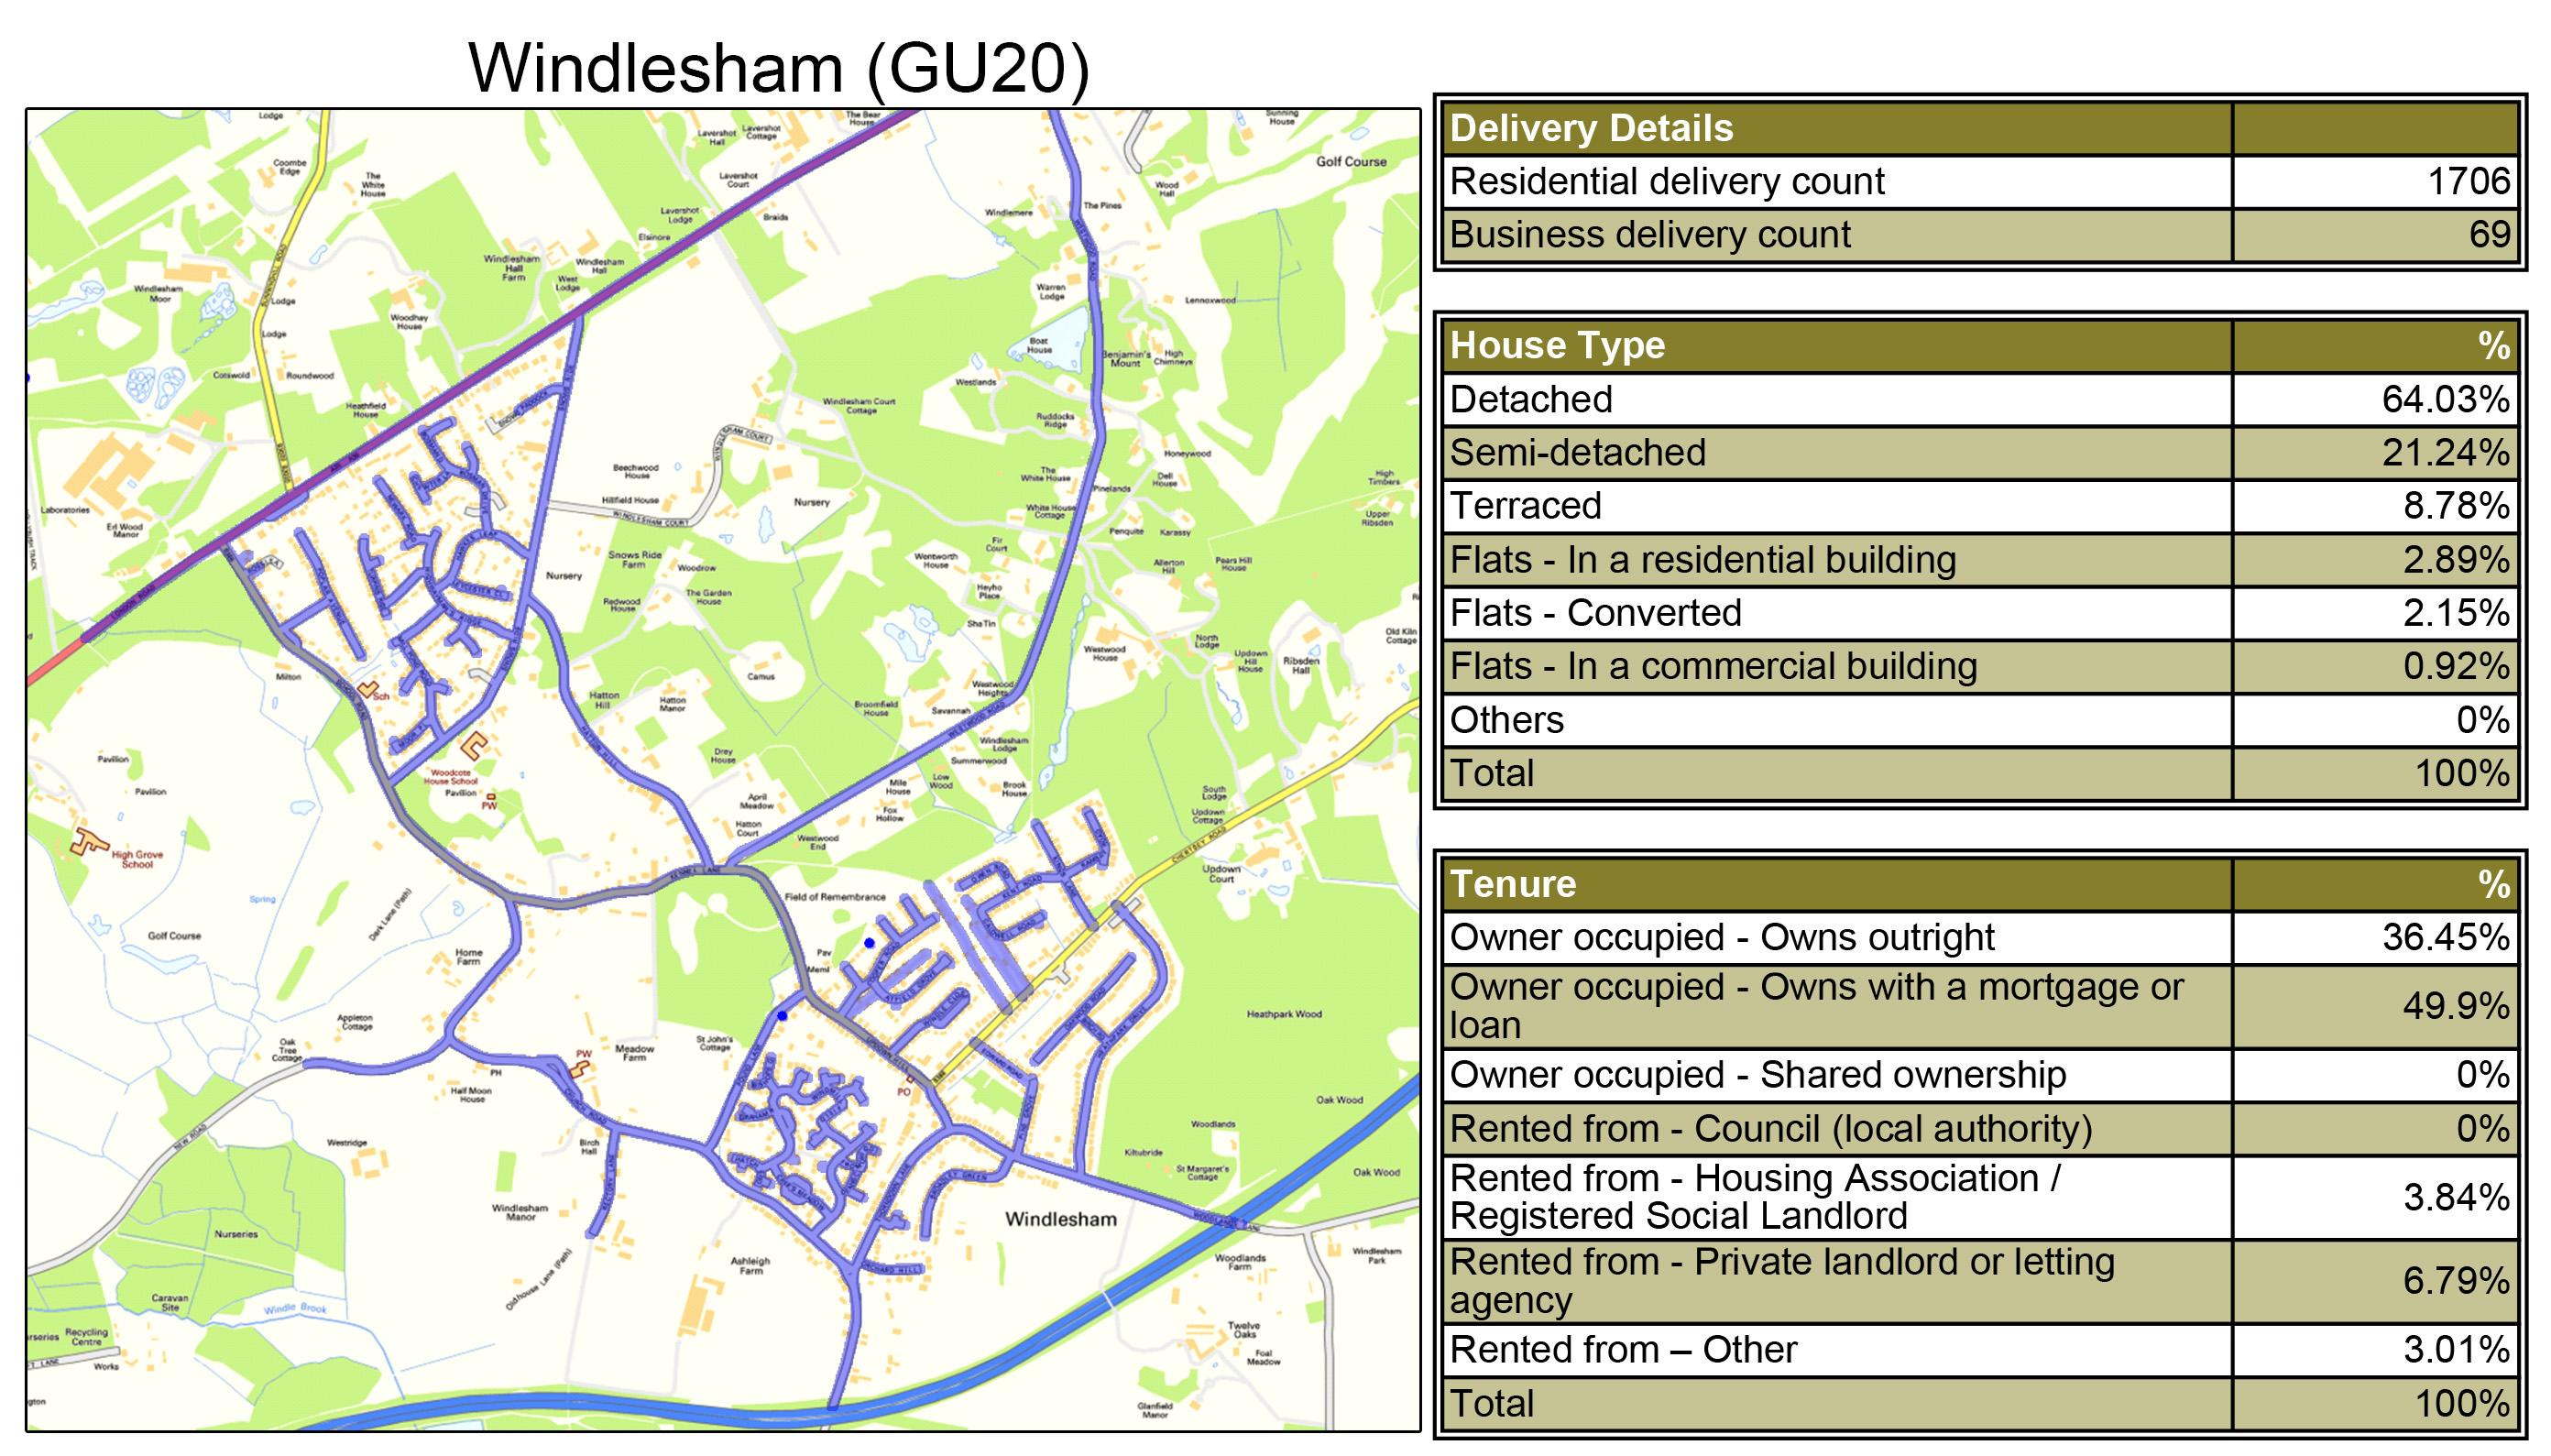 Leaflet Distribution Windlesham - Geoplan Image